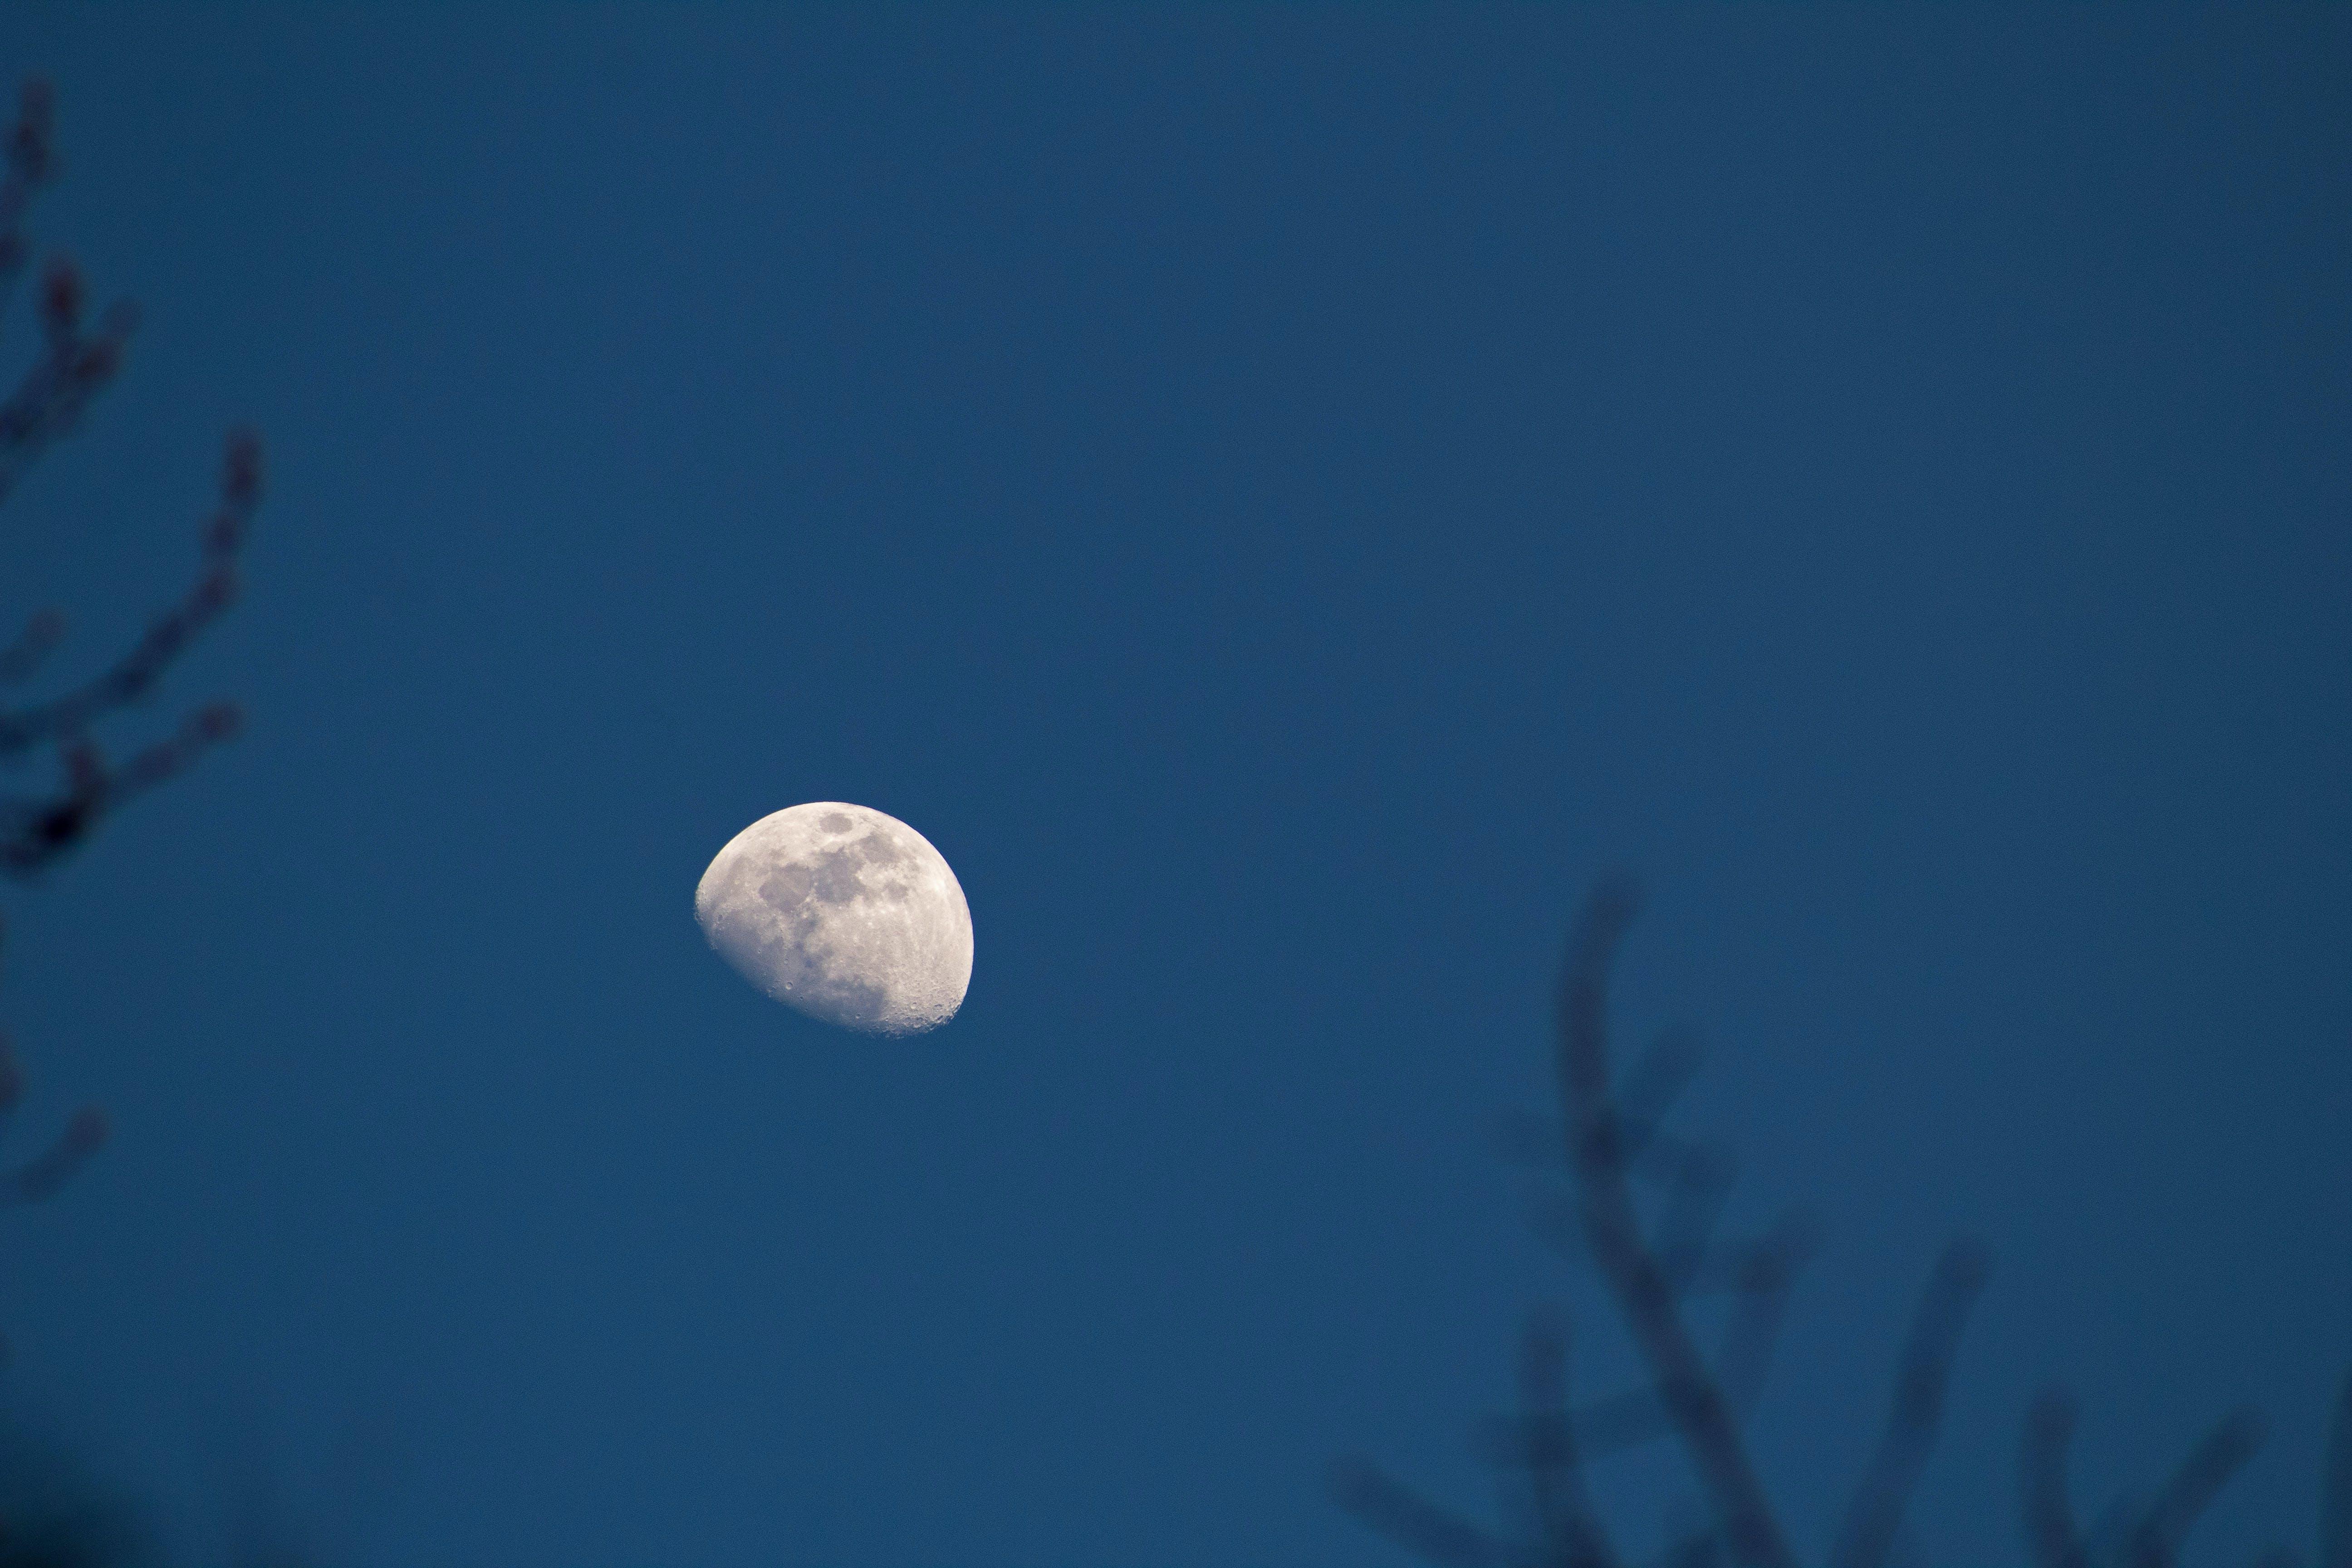 Free stock photo of moon, dusk